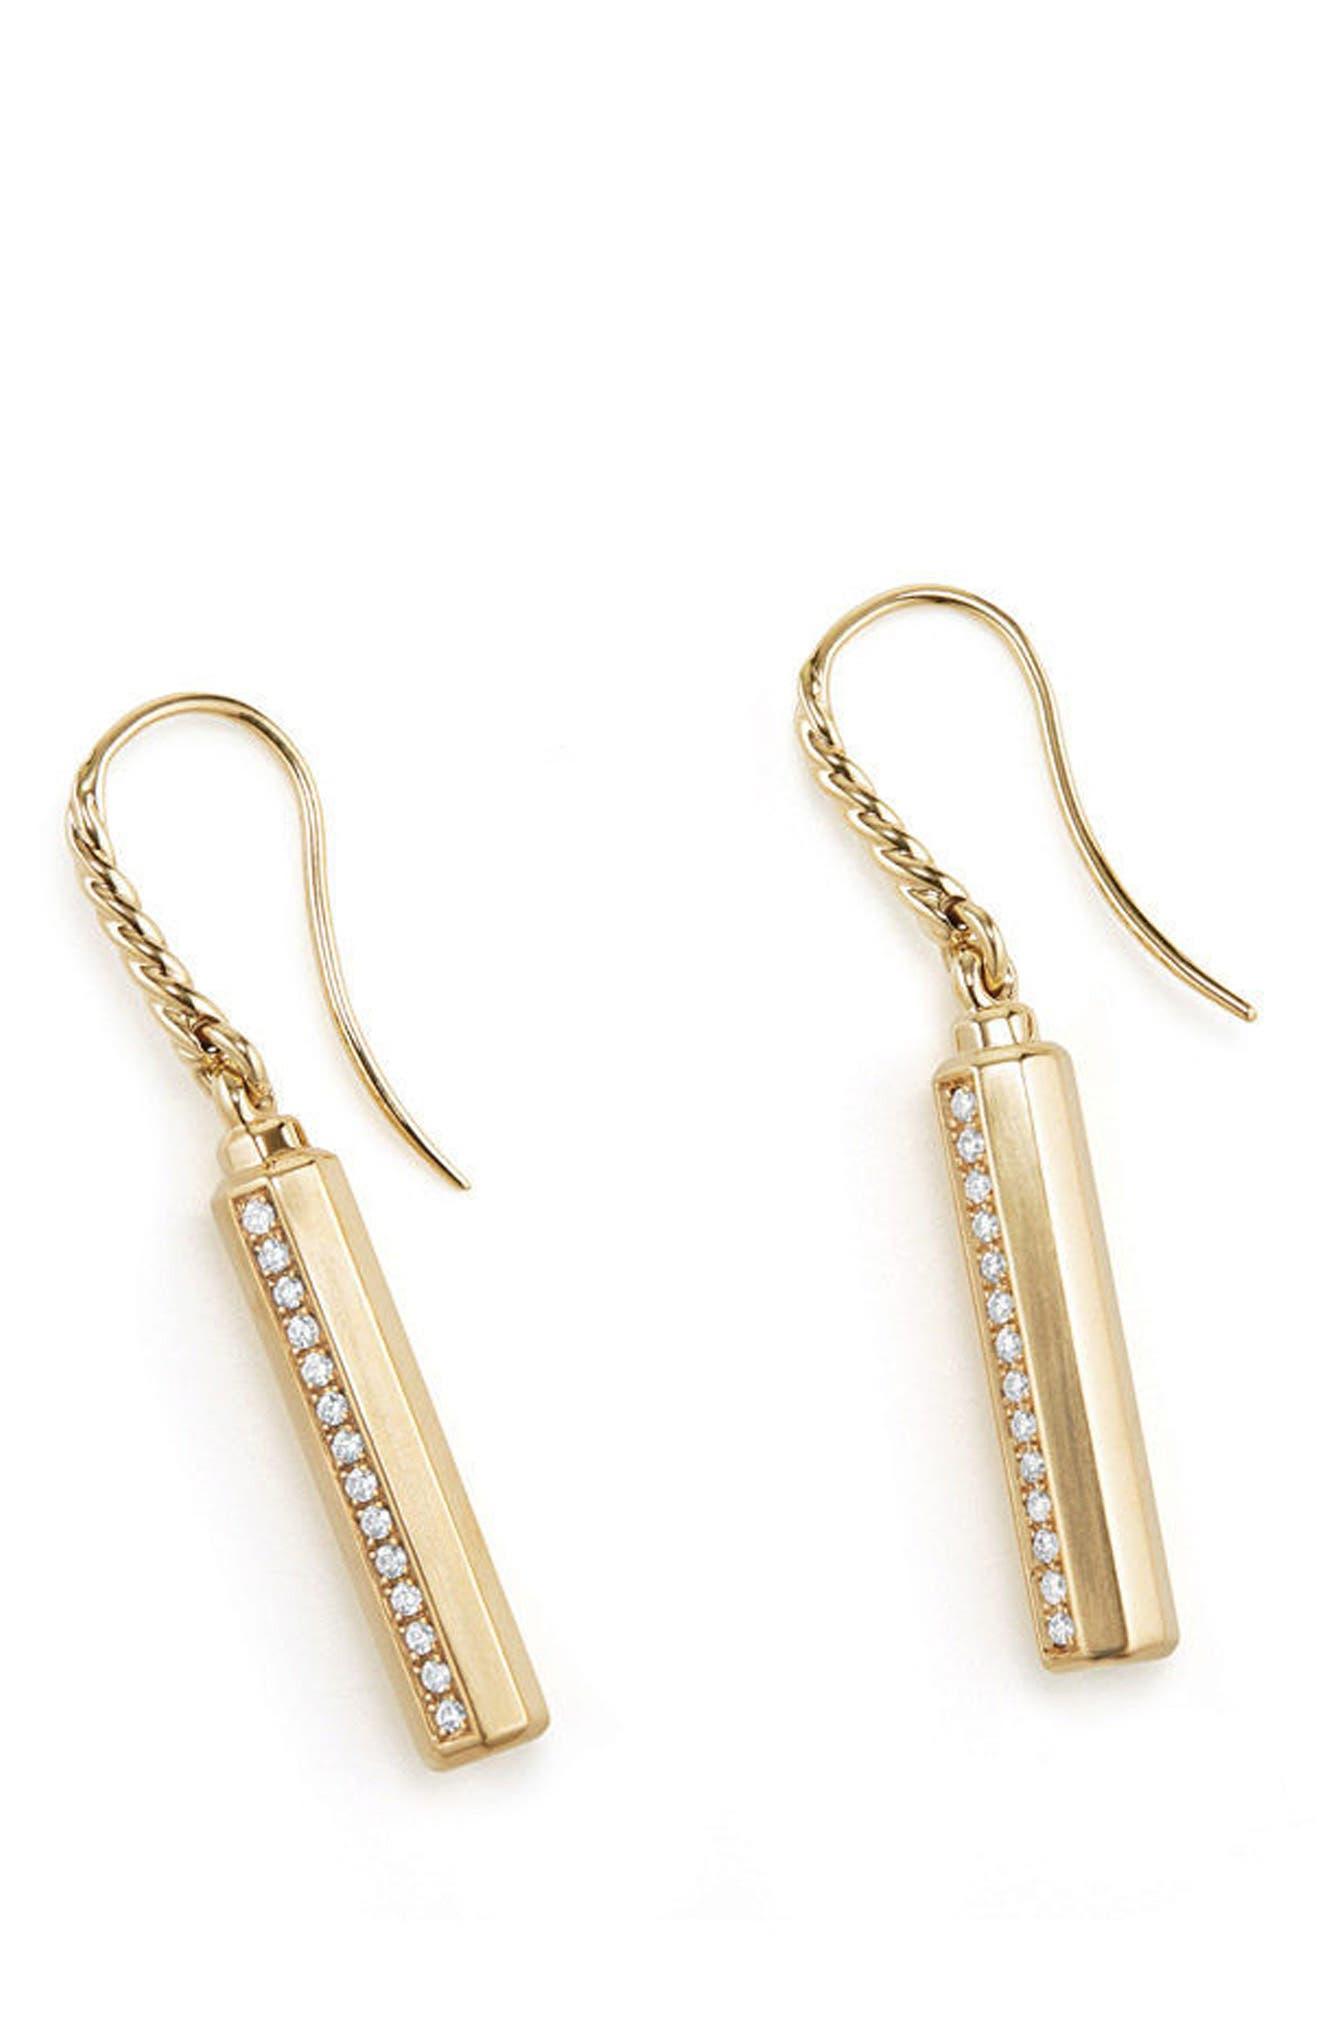 david yurman barrels drop earrings with diamonds in 18k gold